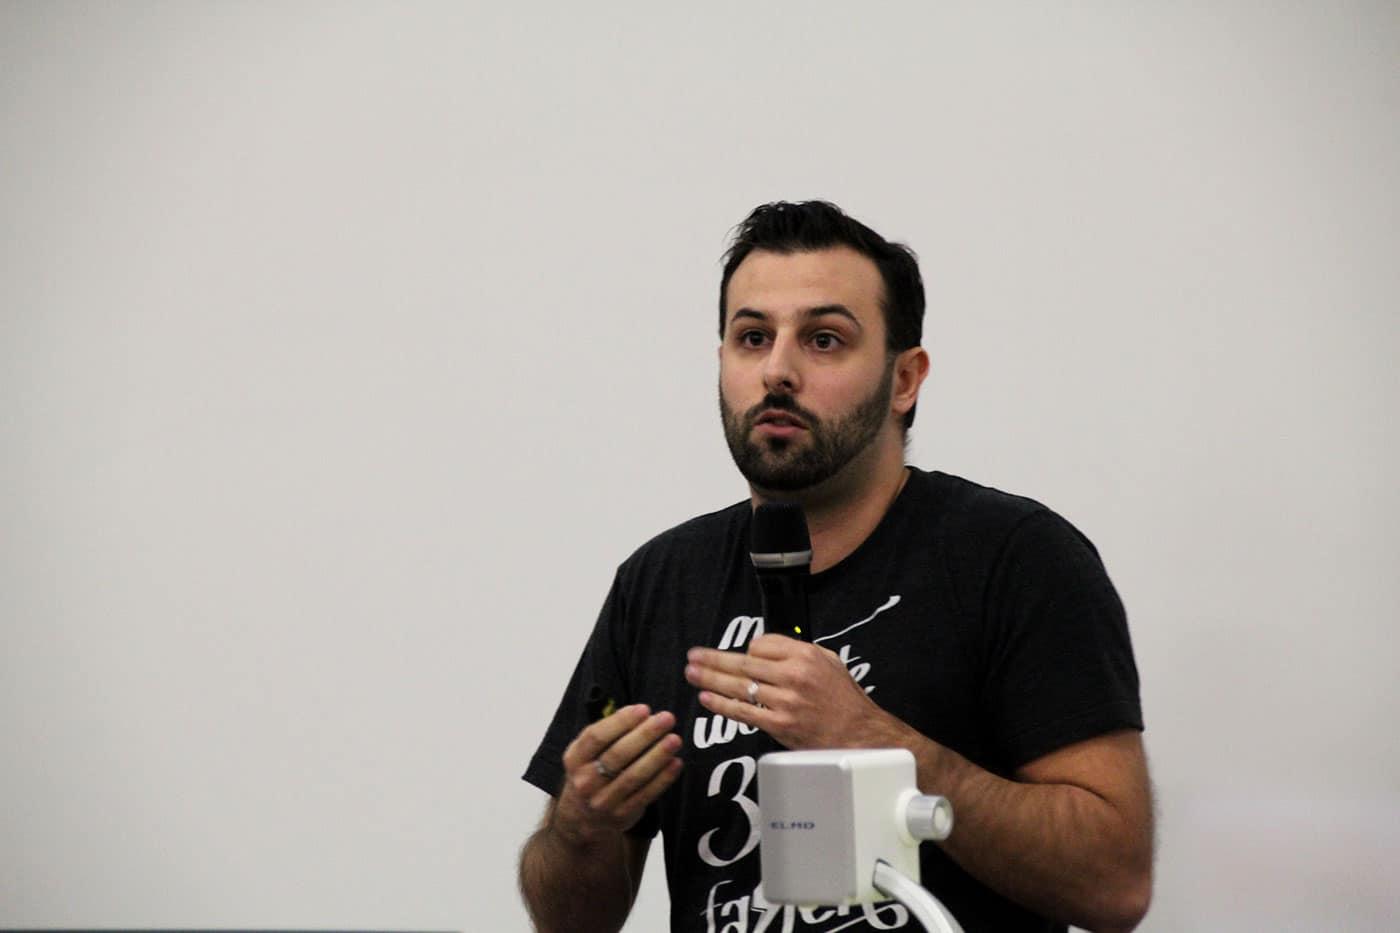 Jonathan Buttigieg on Best practices for Plugin Development